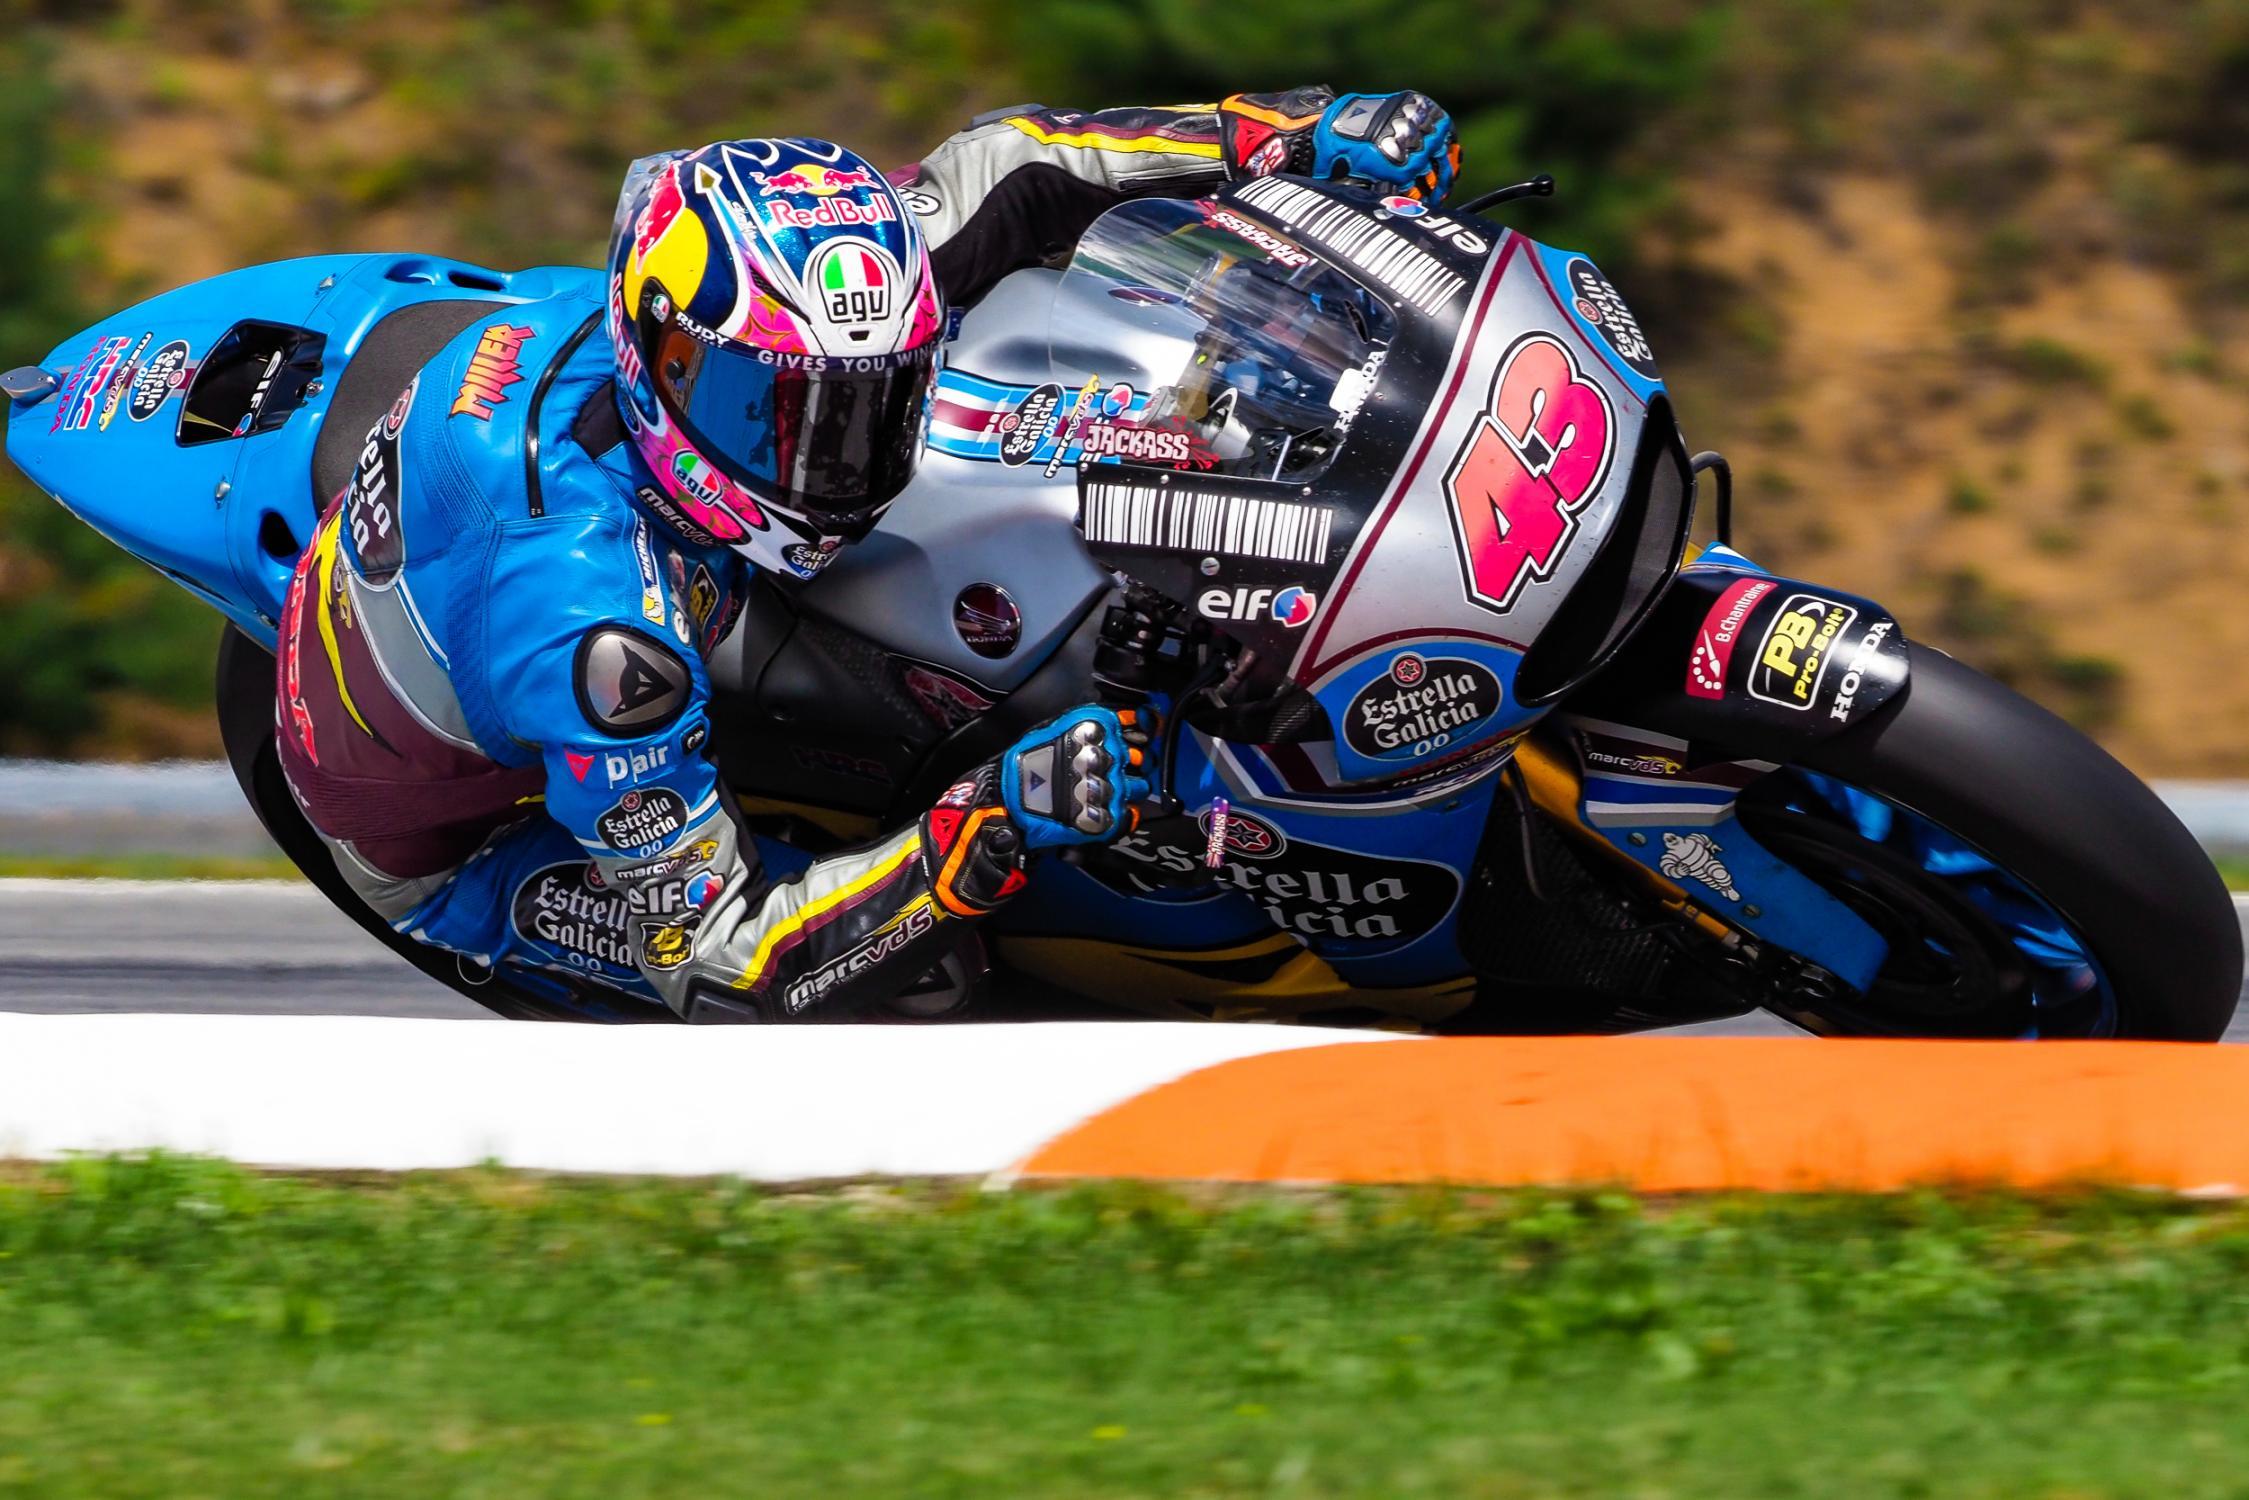 [GP] Brno 43-jack-miller-aus_8070550.gallery_full_top_fullscreen